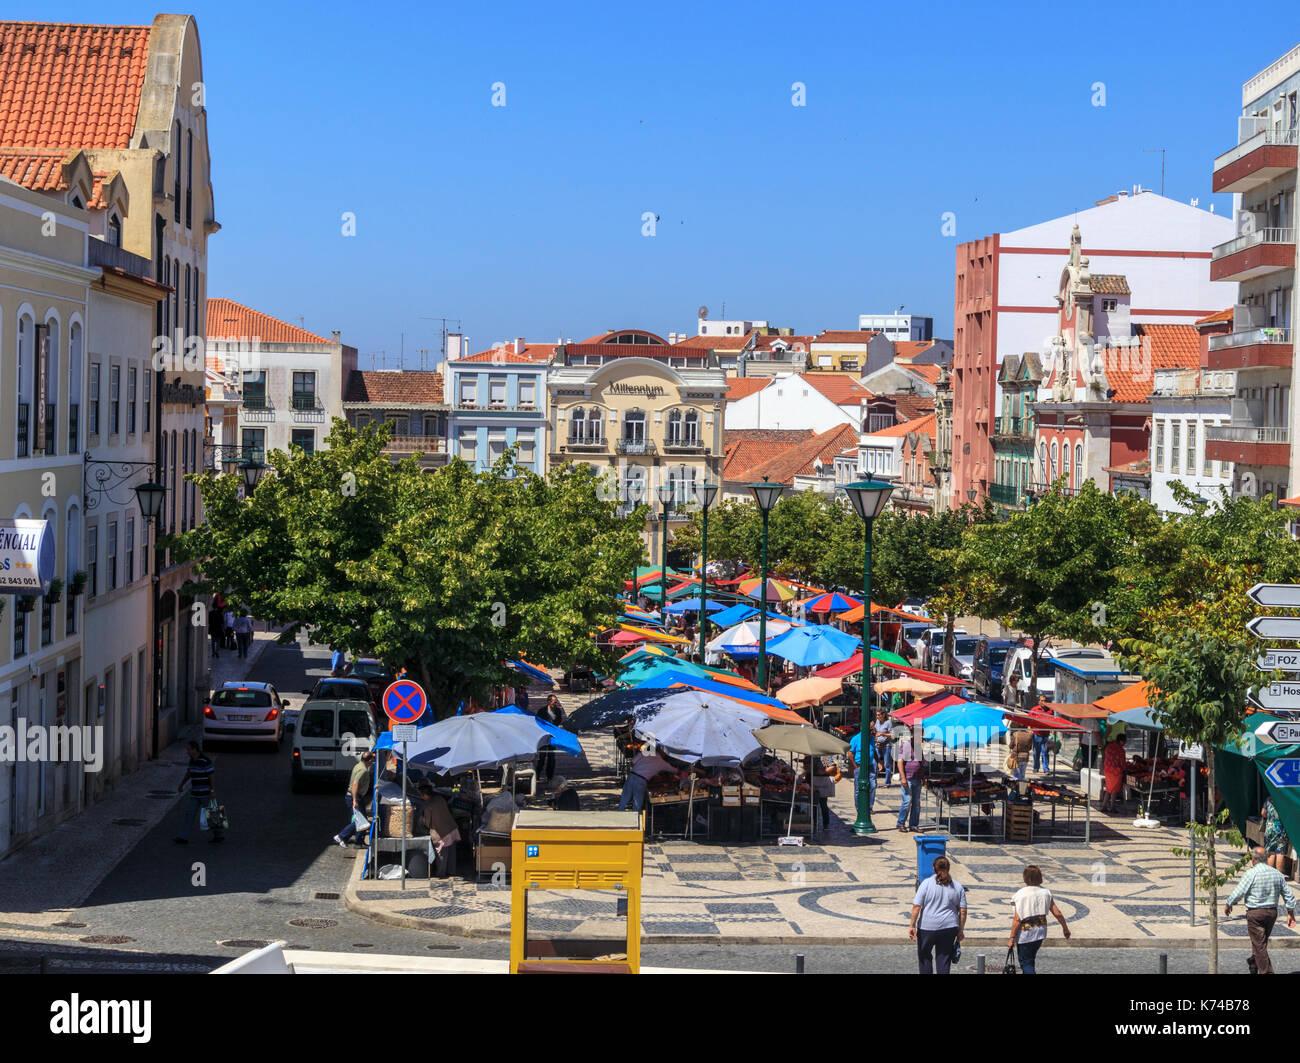 Looking along the Praca Da Fruta daily morning market in Caldas da Rainha Portugal - Stock Image